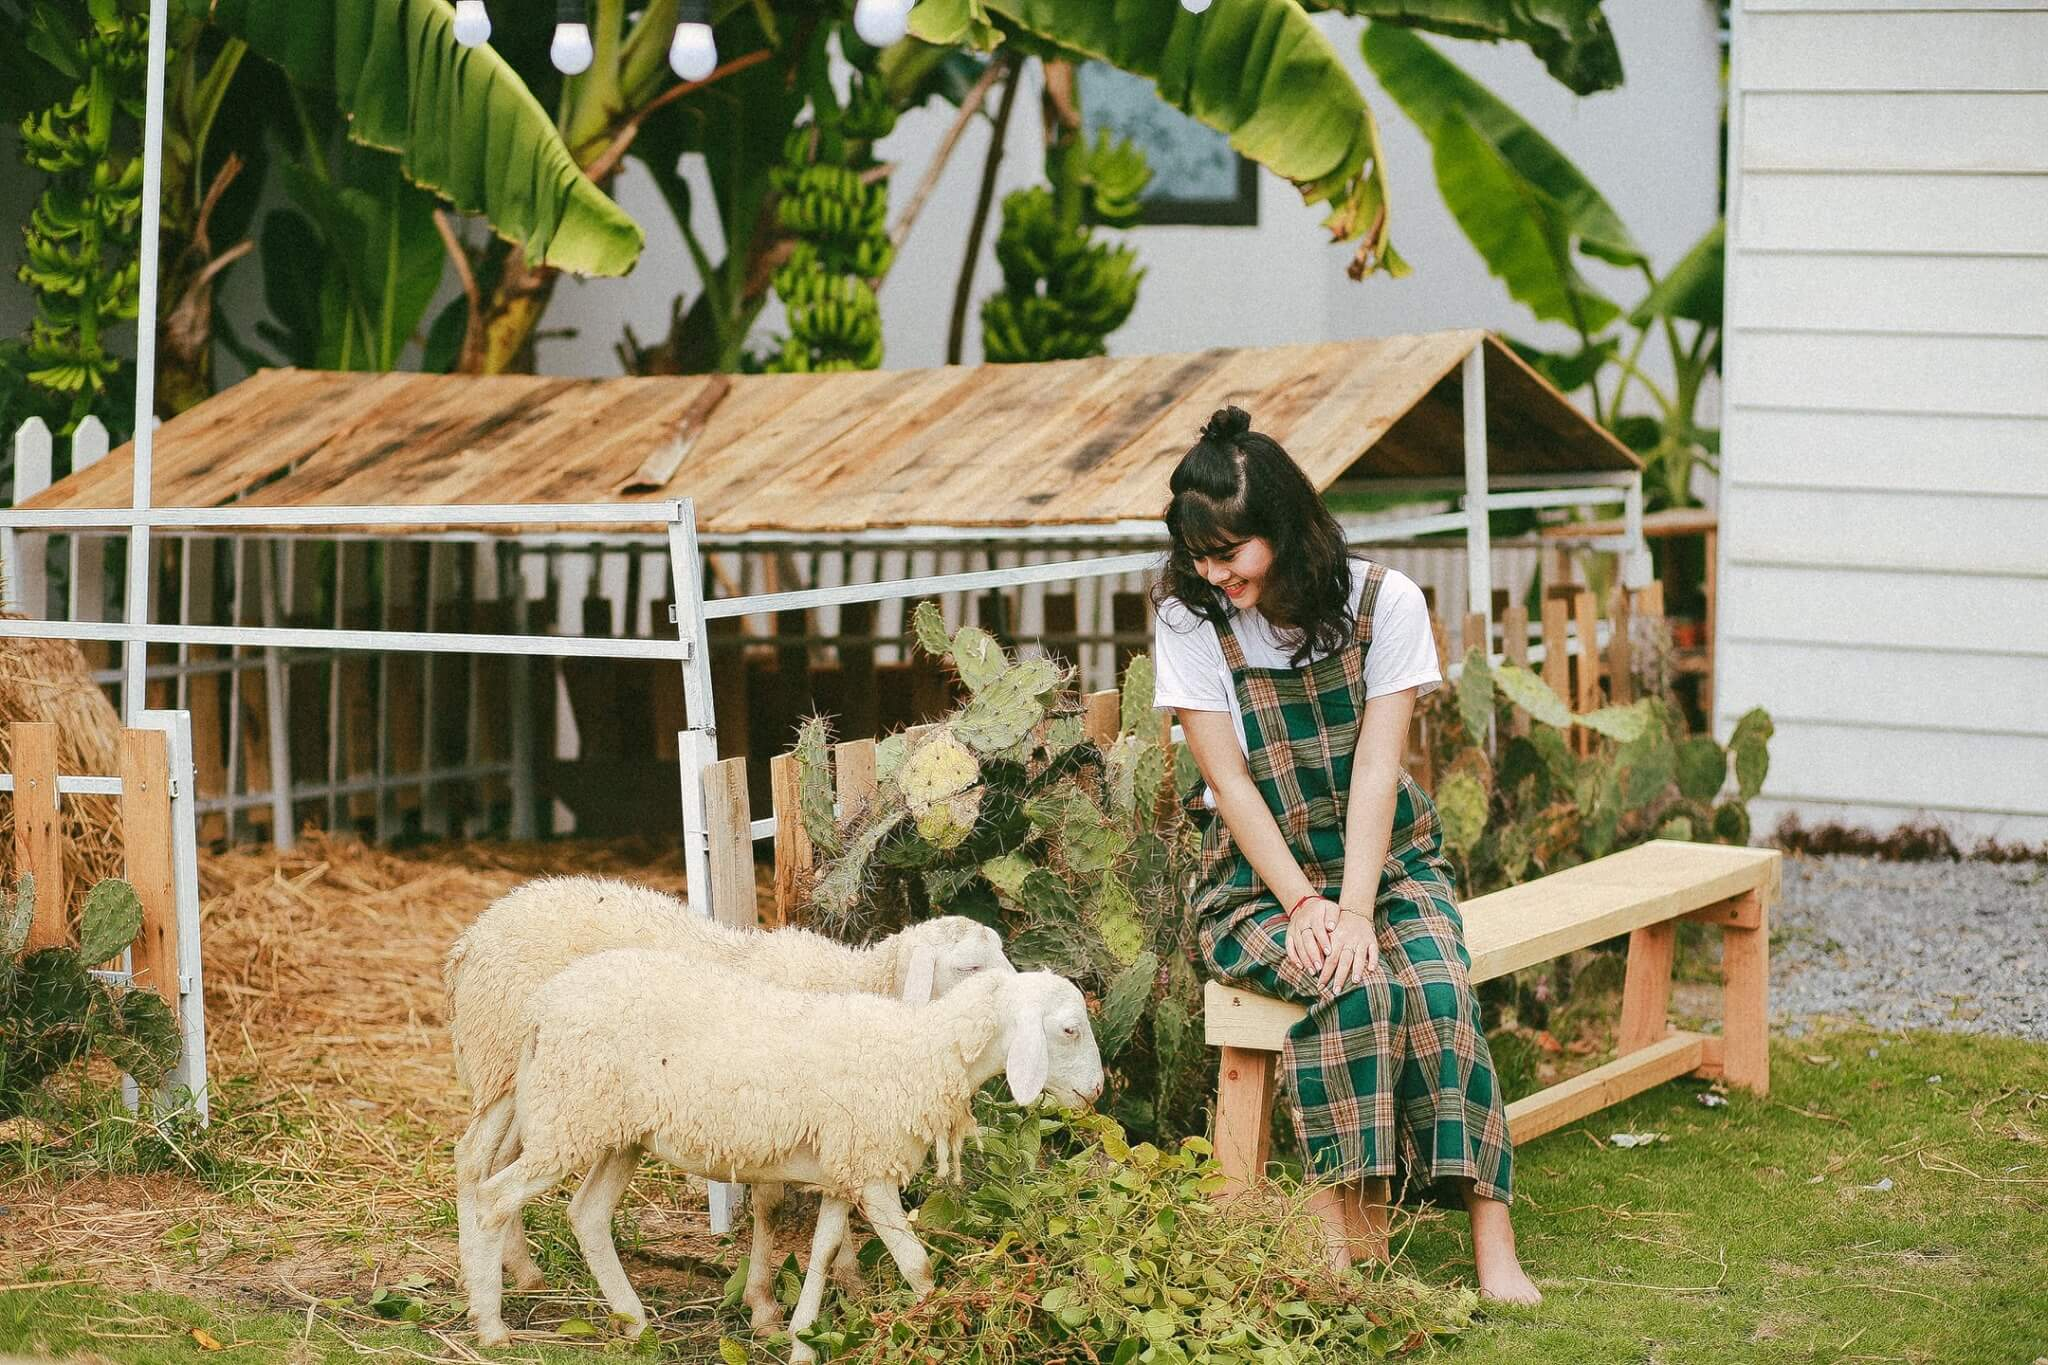 Dream House Phim Truong Moi Toanh Tai Da Nang Fantasticity Com 03